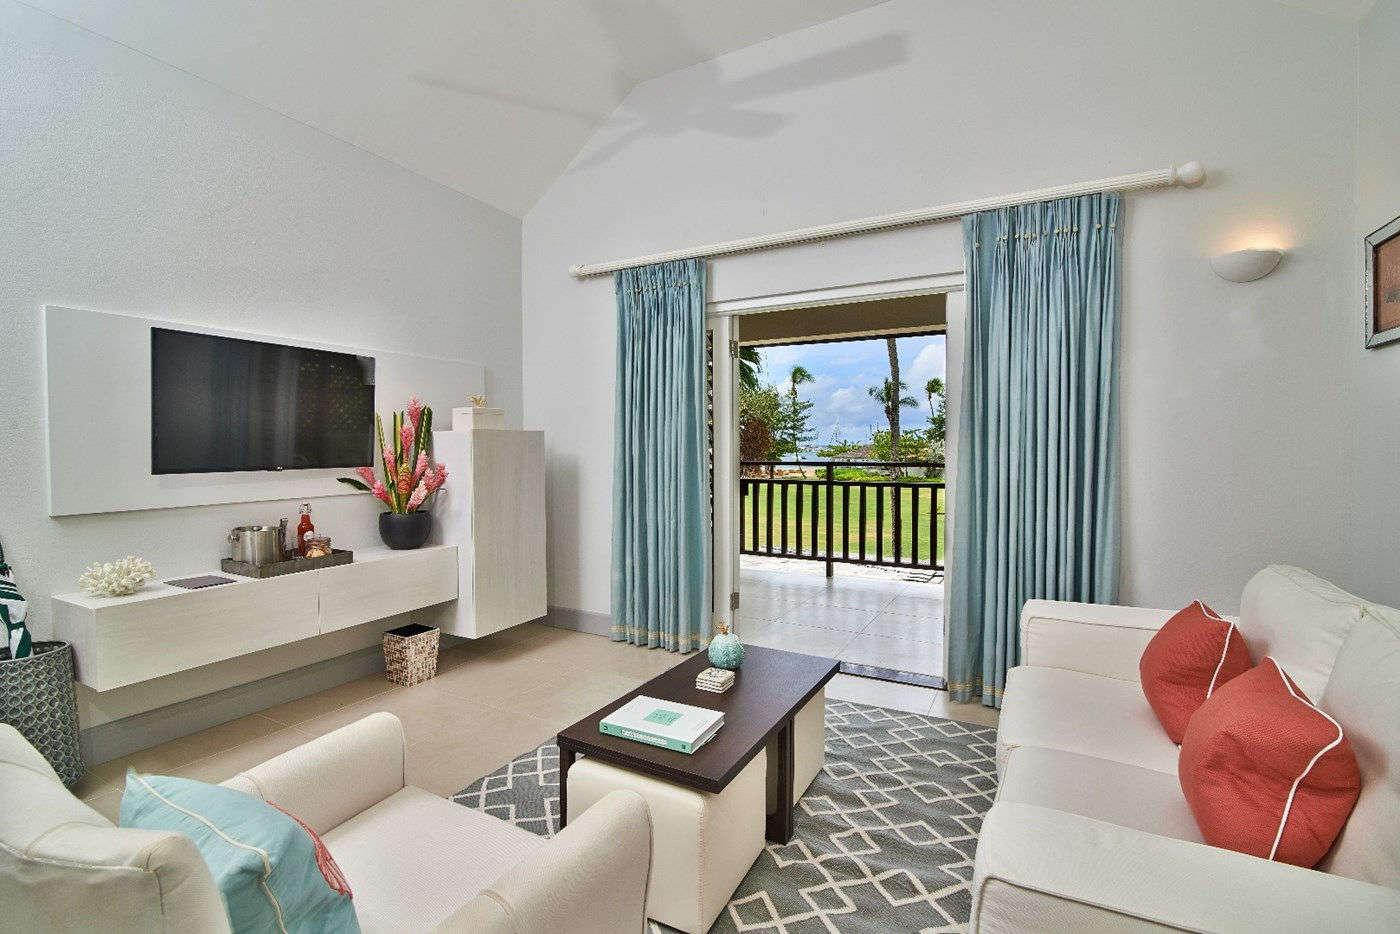 Luxury villa rentals caribbean - Grenada - Lanse aux epines - Calabash hotel - Calabash Junior Suite - Image 1/4